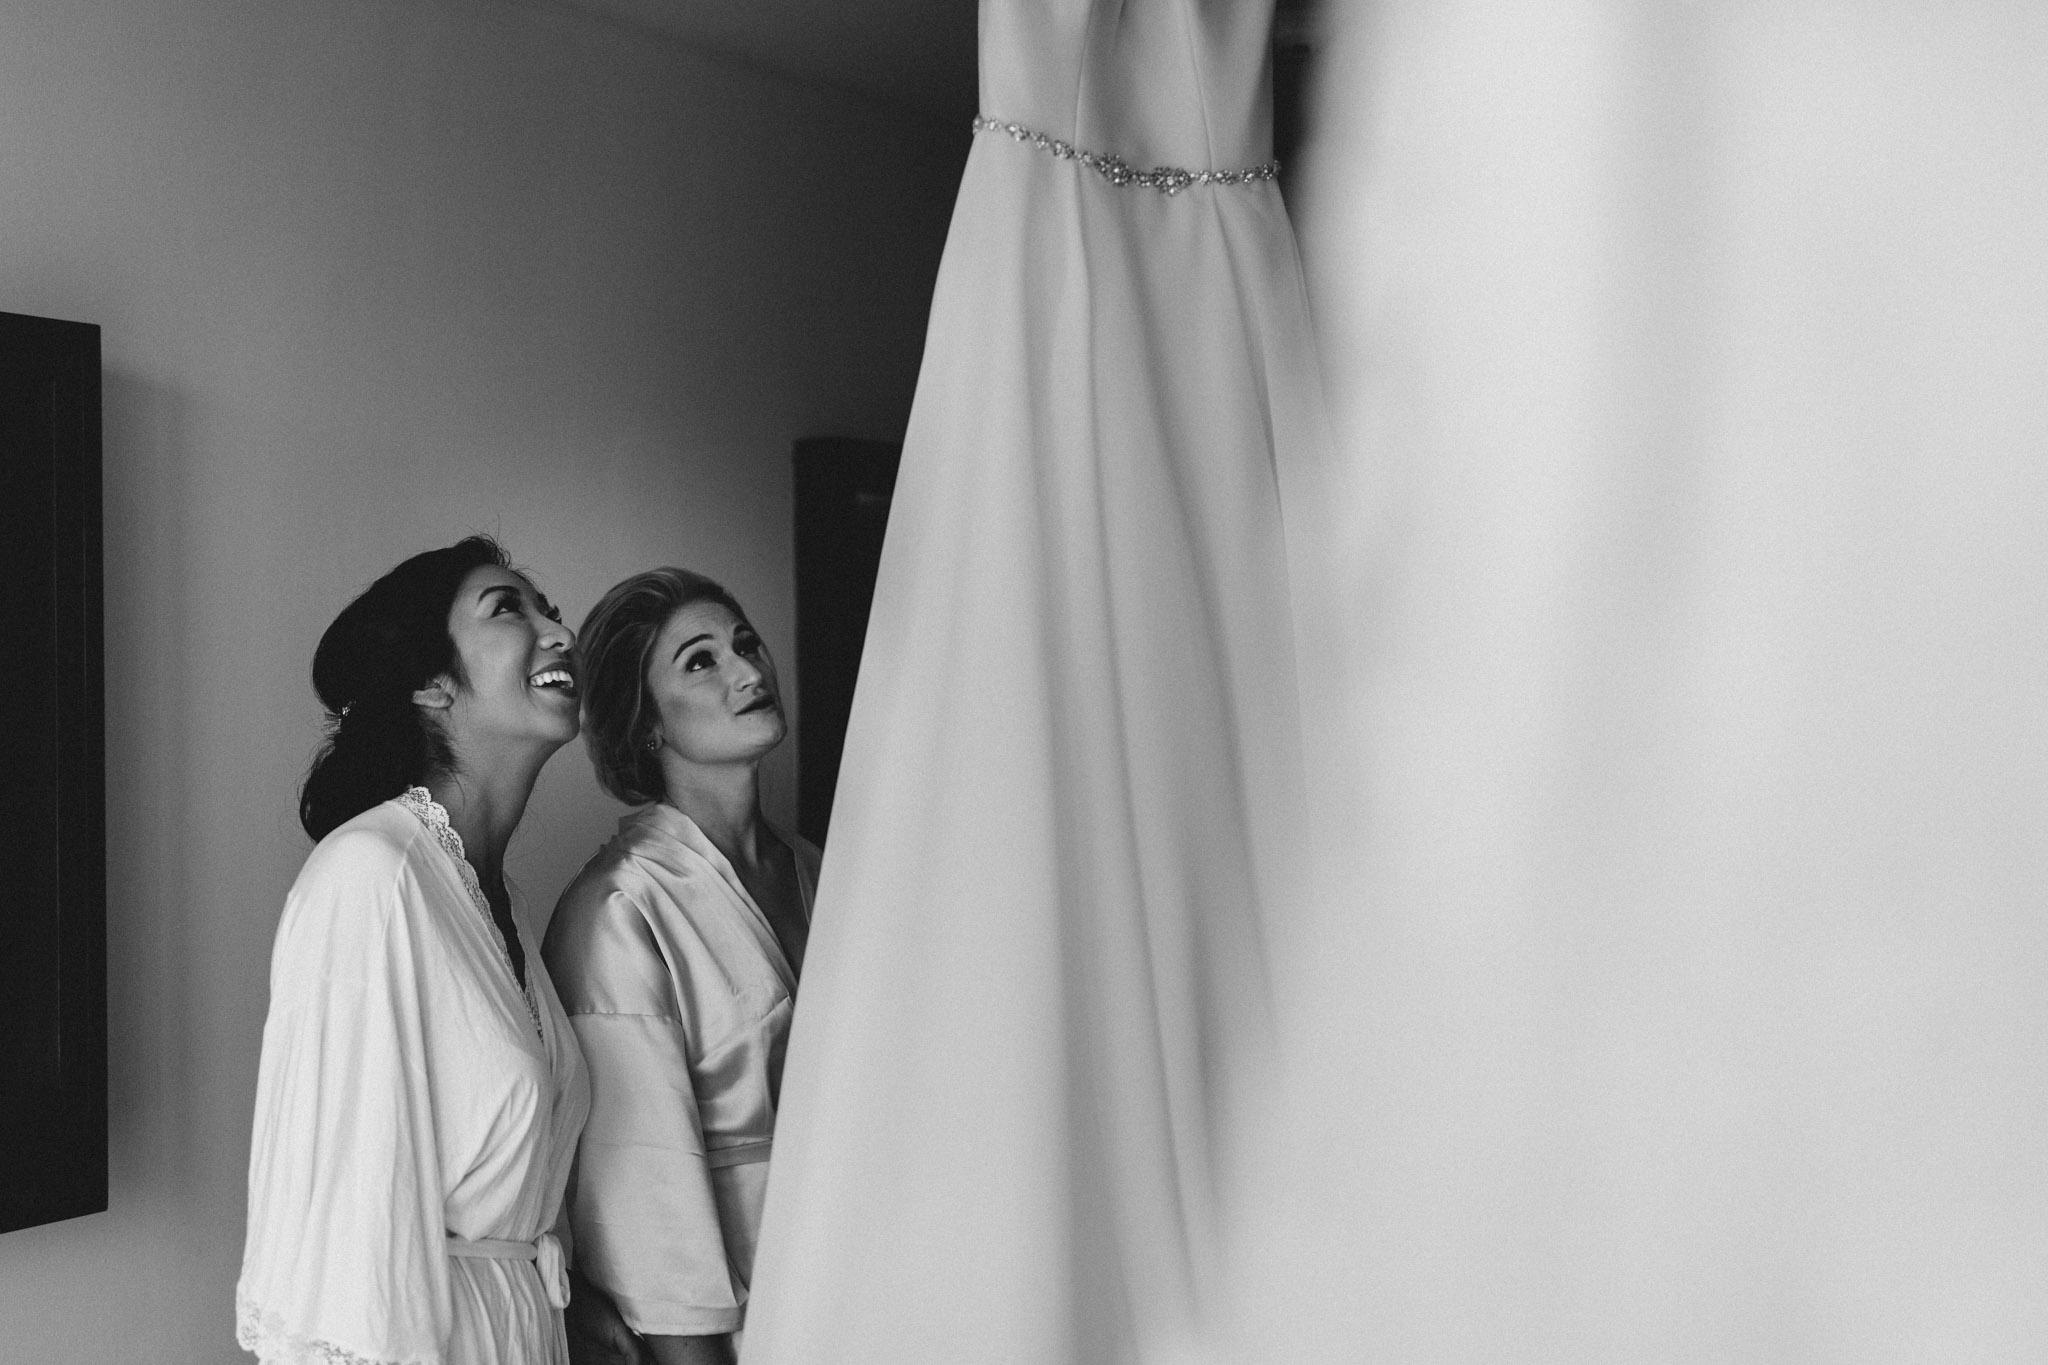 Cancun Mexico Wedding - admiring the dress